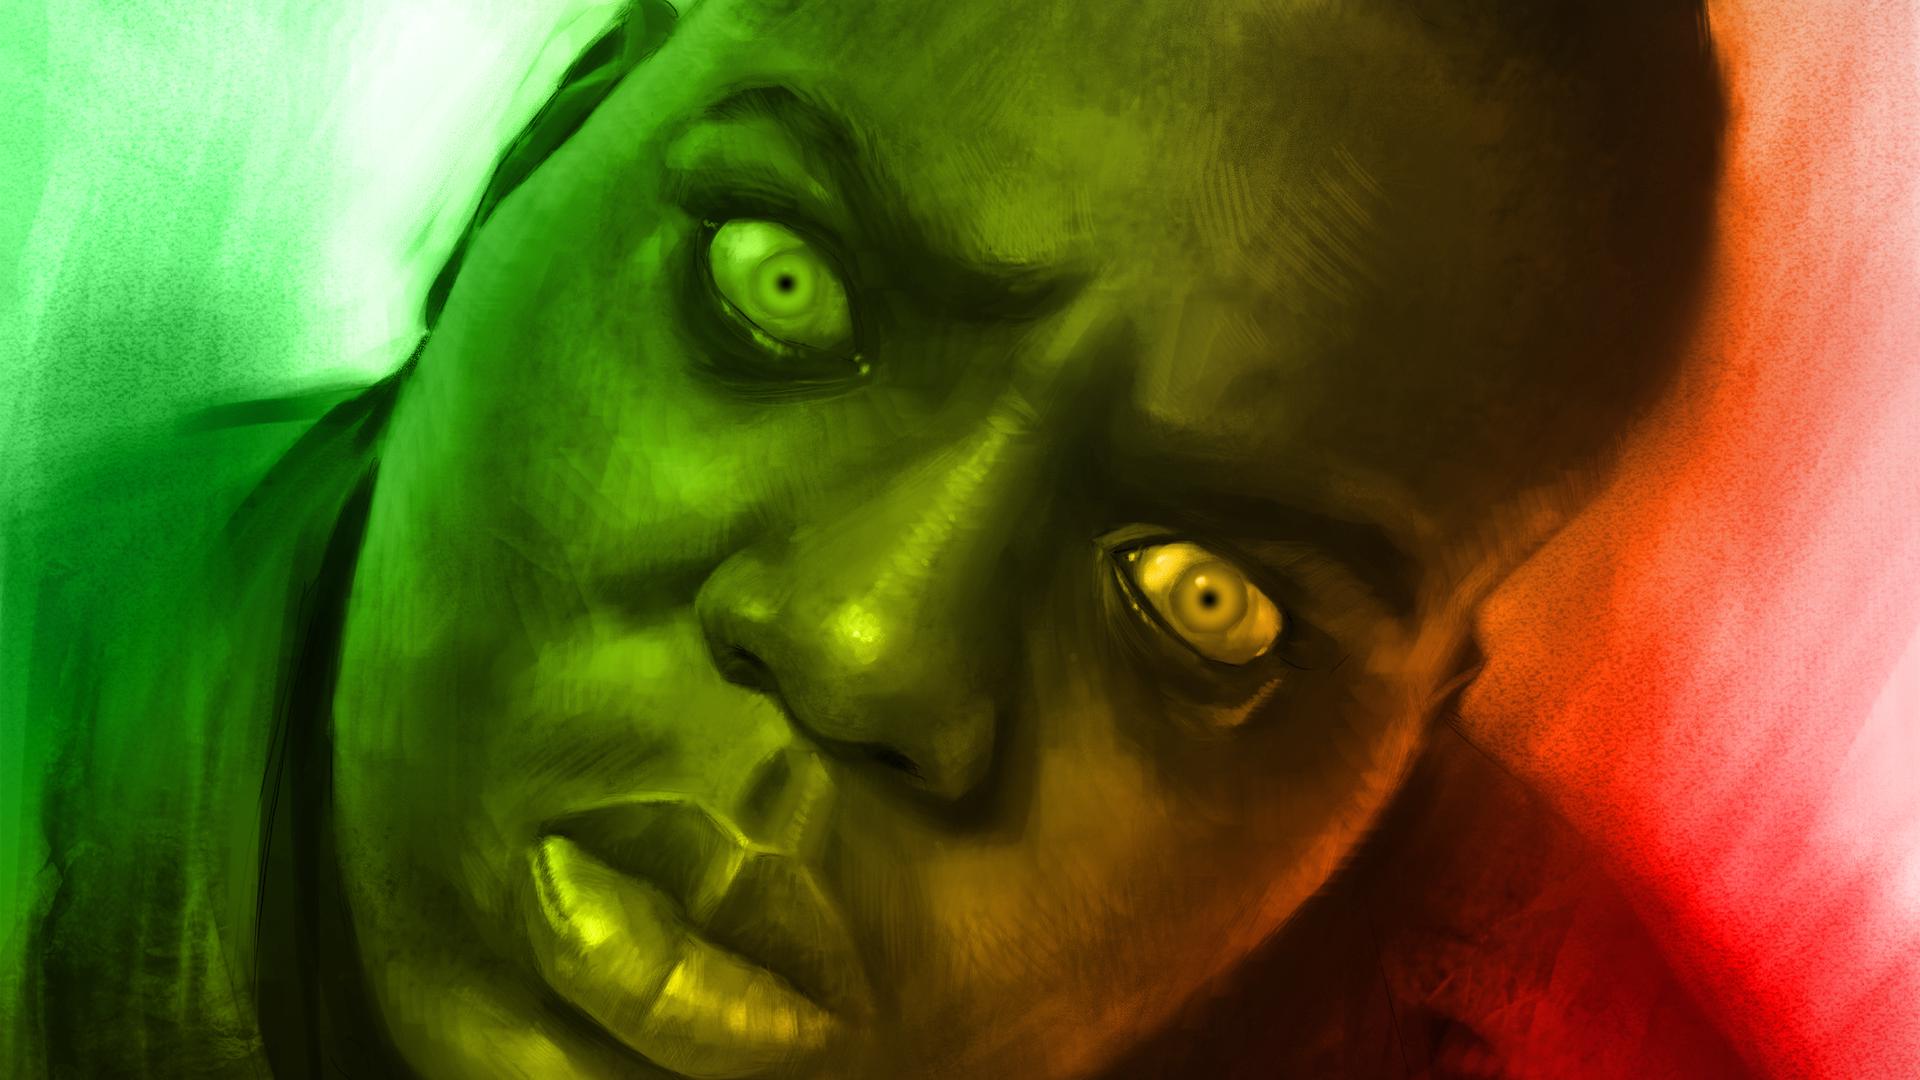 Biggie Mad As Fuck Smalls Hd Wallpaper Background Image